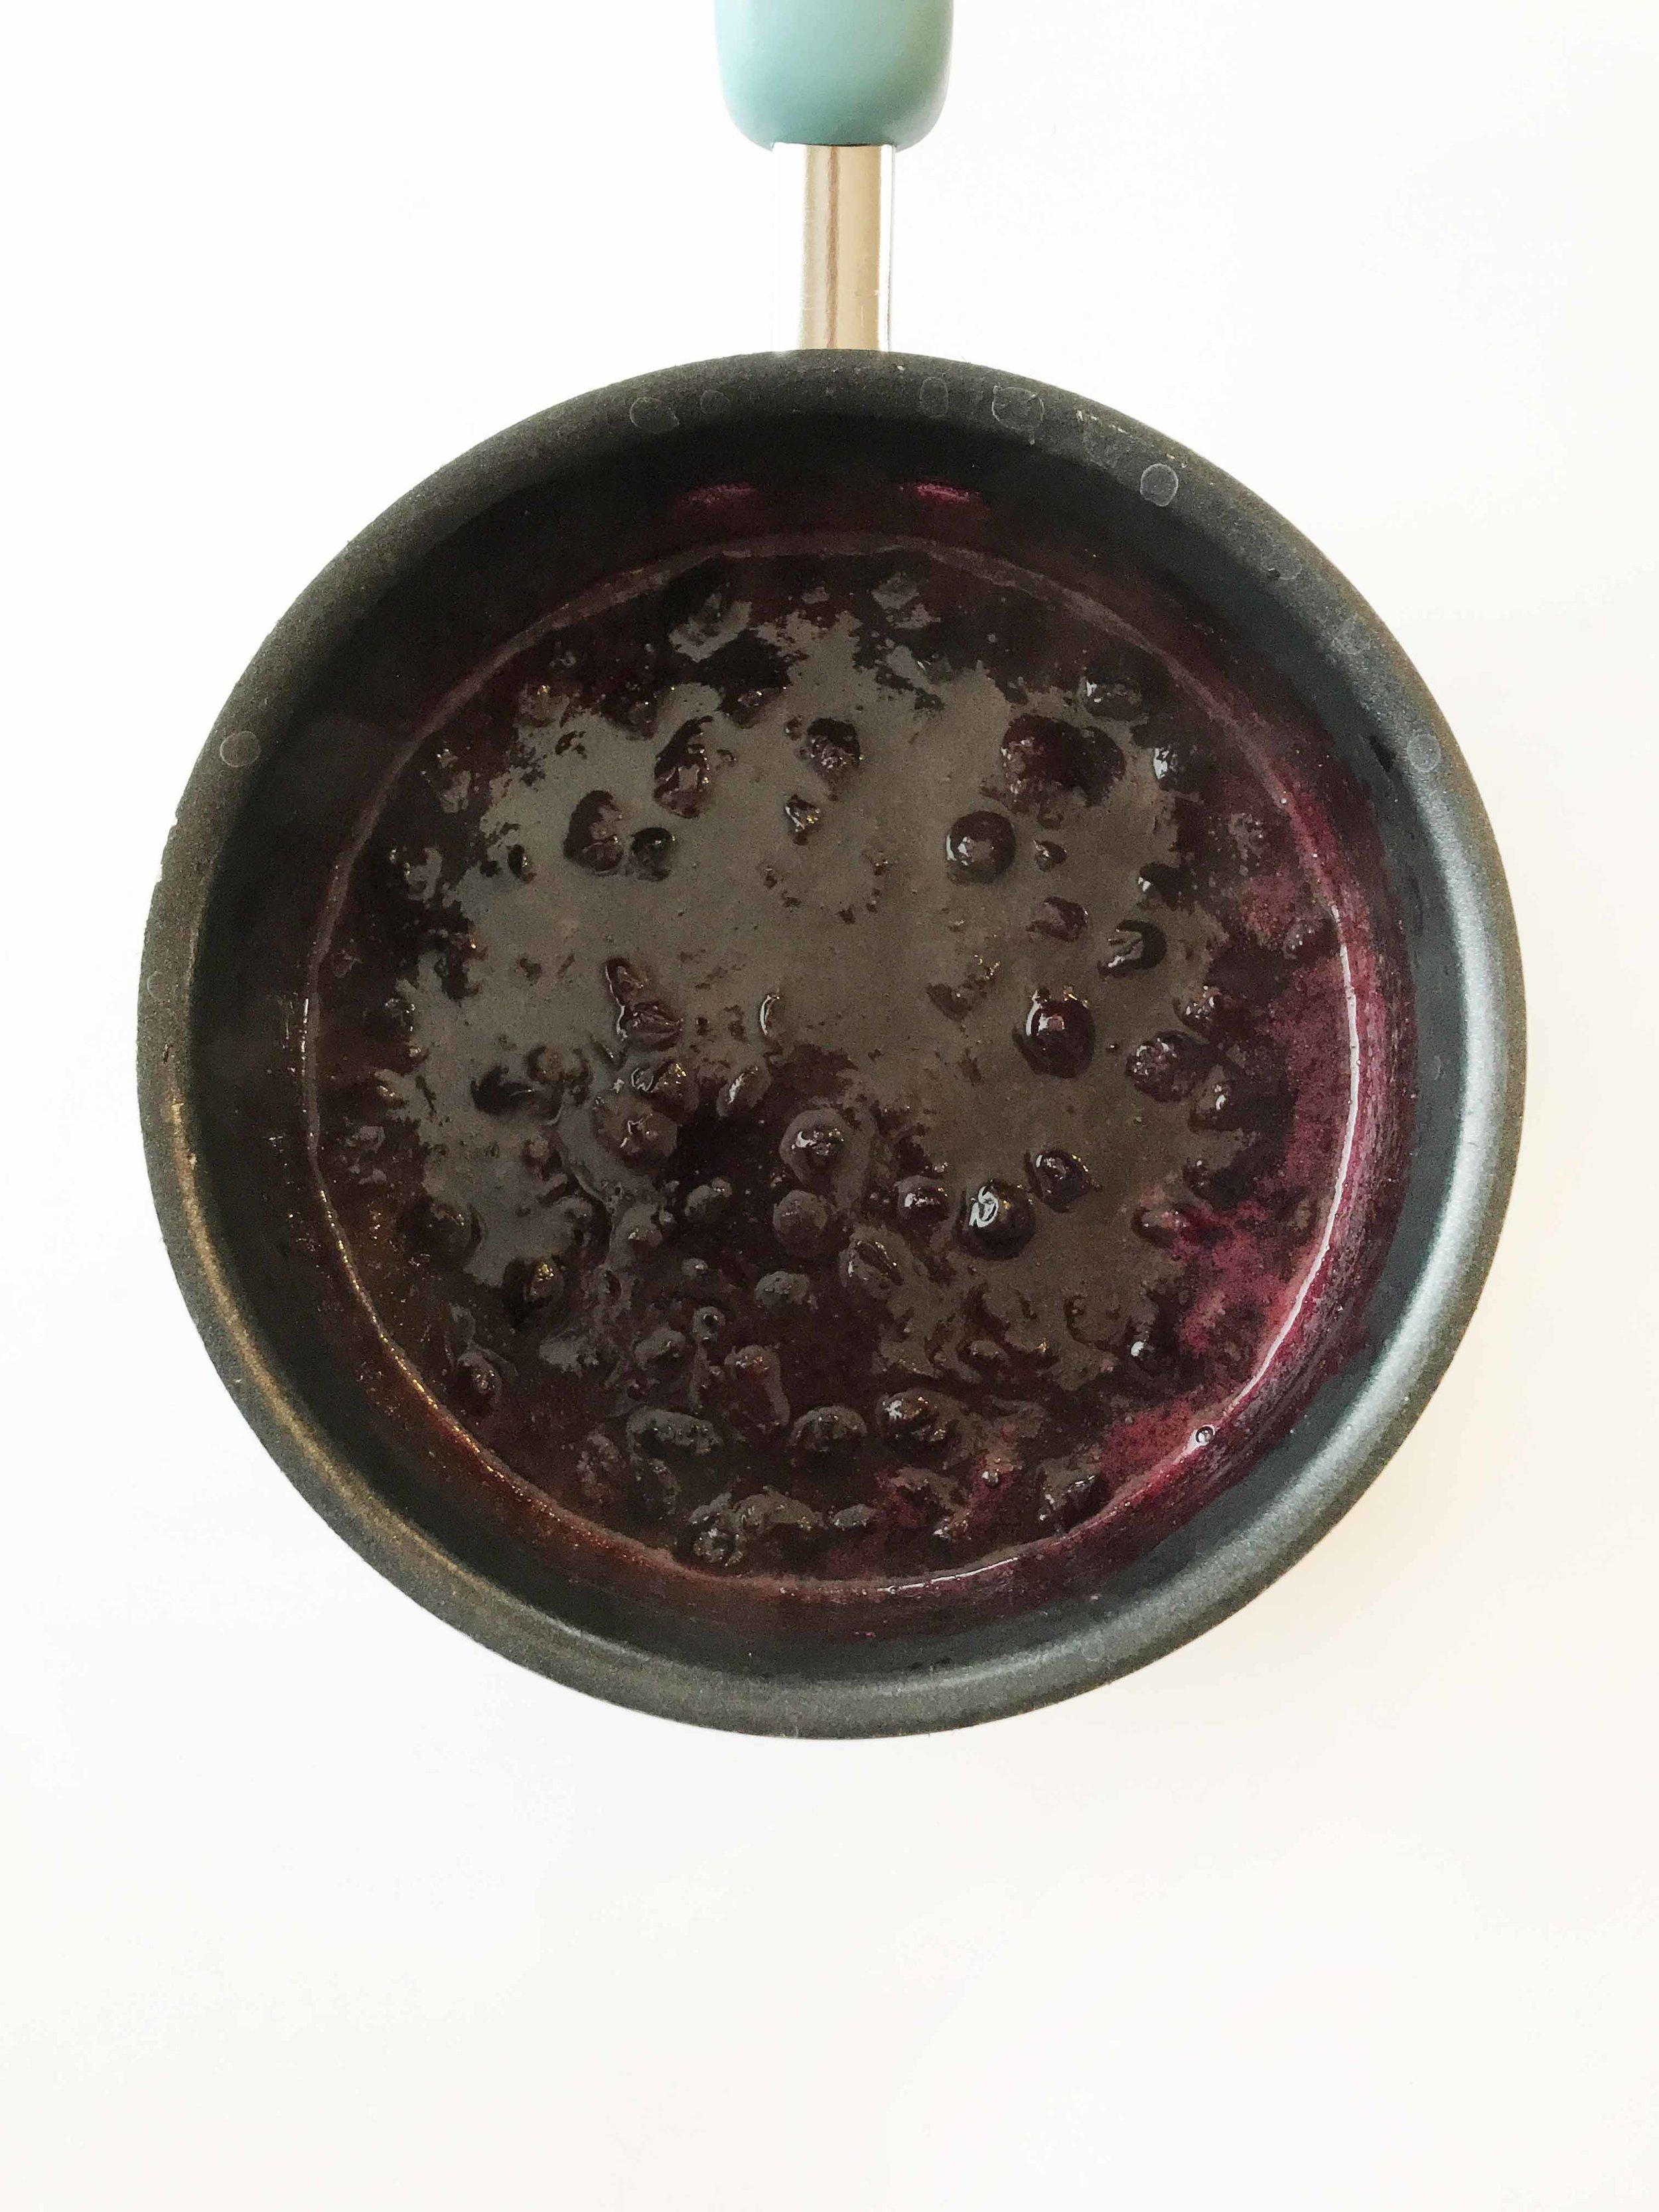 blueberry-cheesecake-dip6.jpg